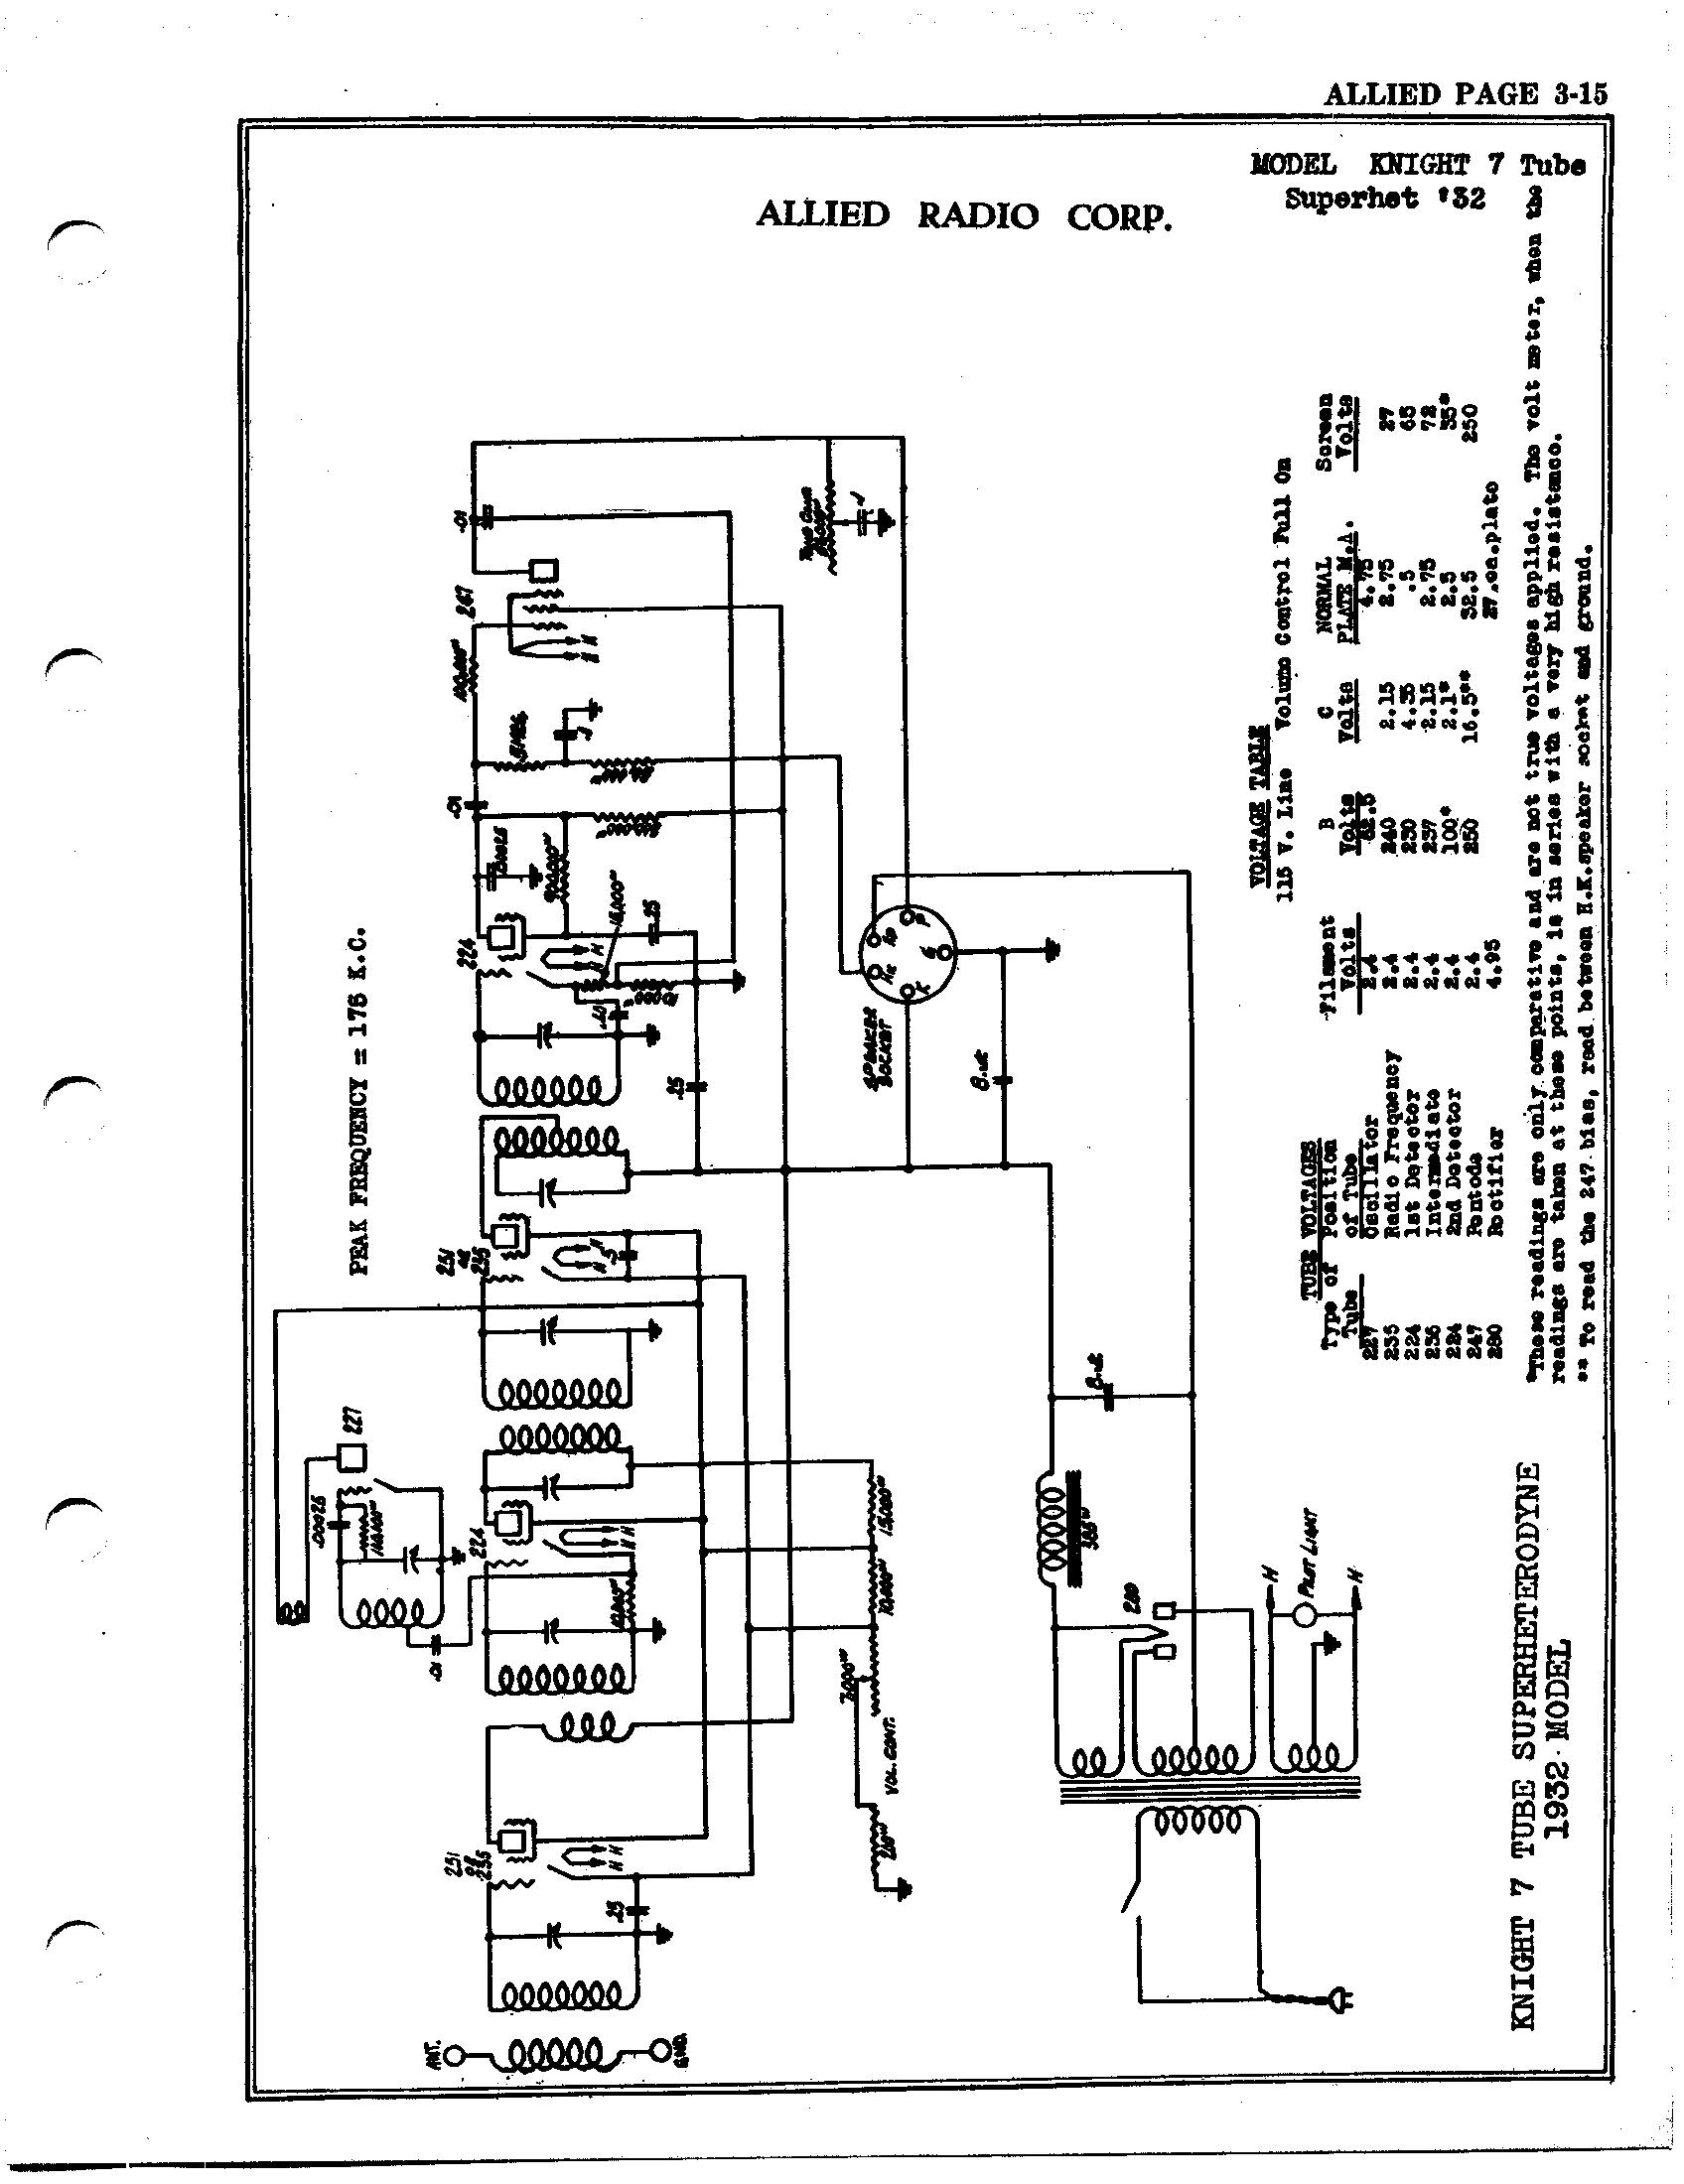 Allied Radio Corp 7 Tube Super 32 Antique Electronic